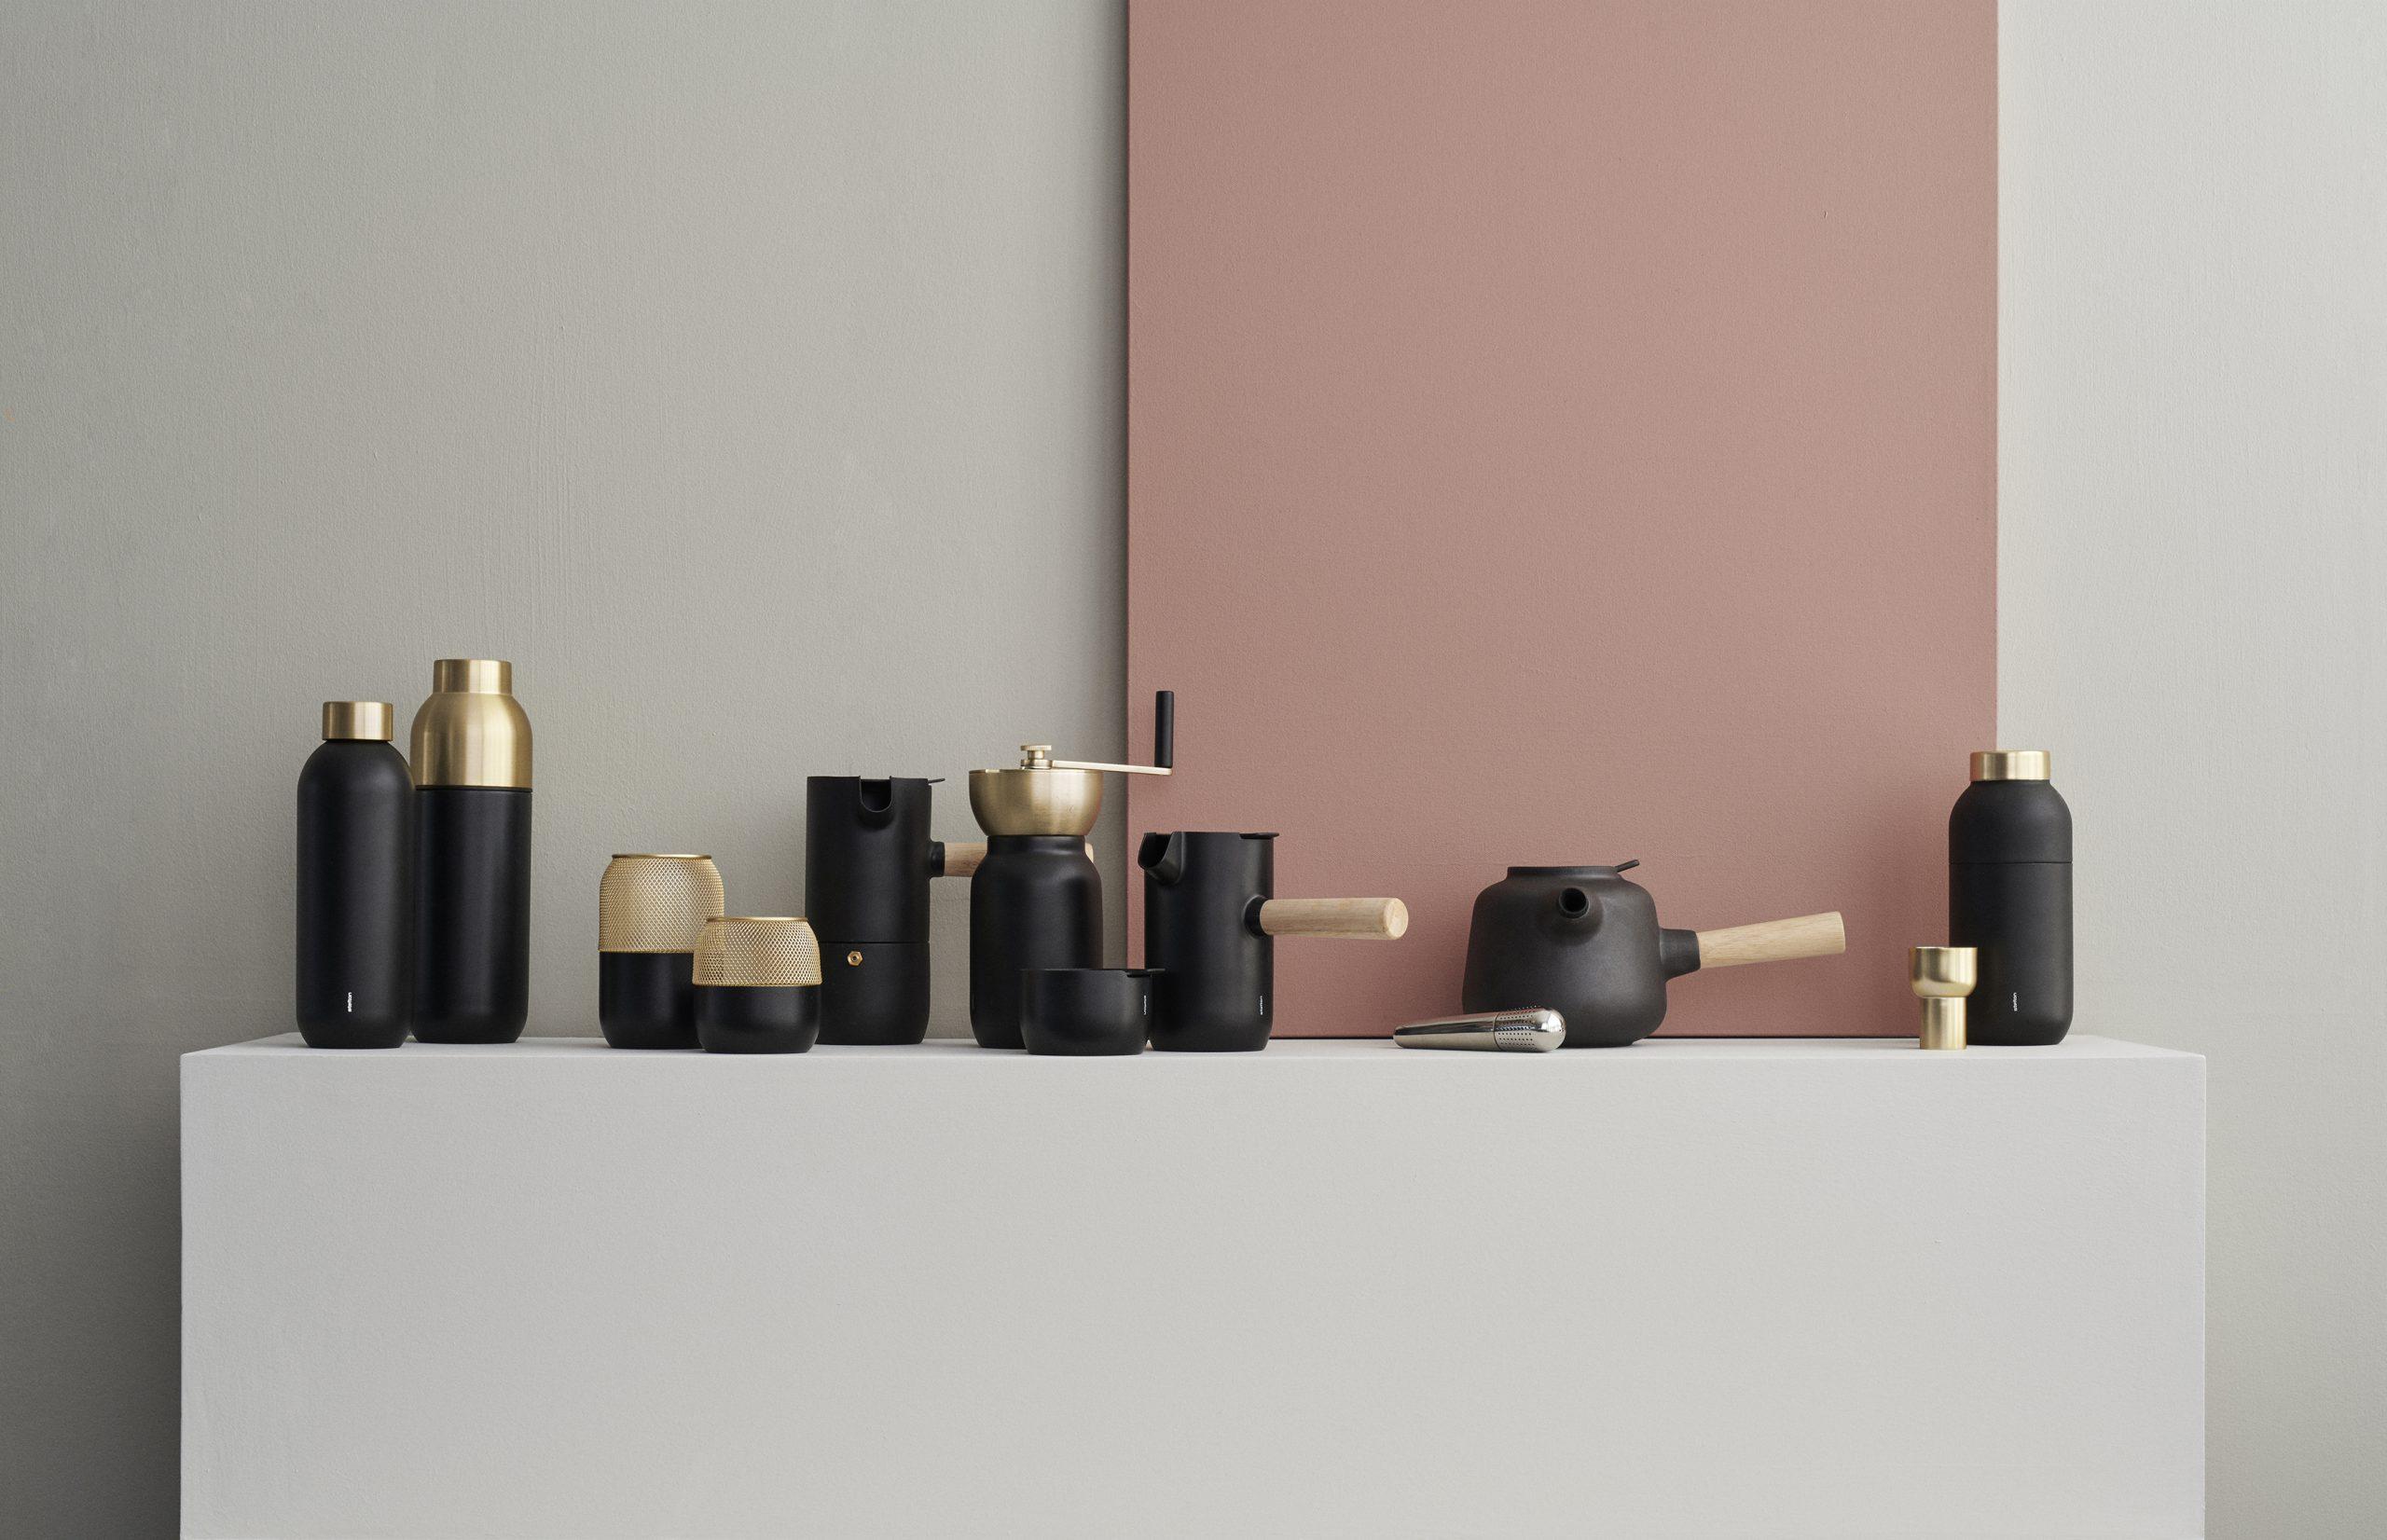 Collar collection, Mesh Tealight holder by Debiasi Sandri for Stelton